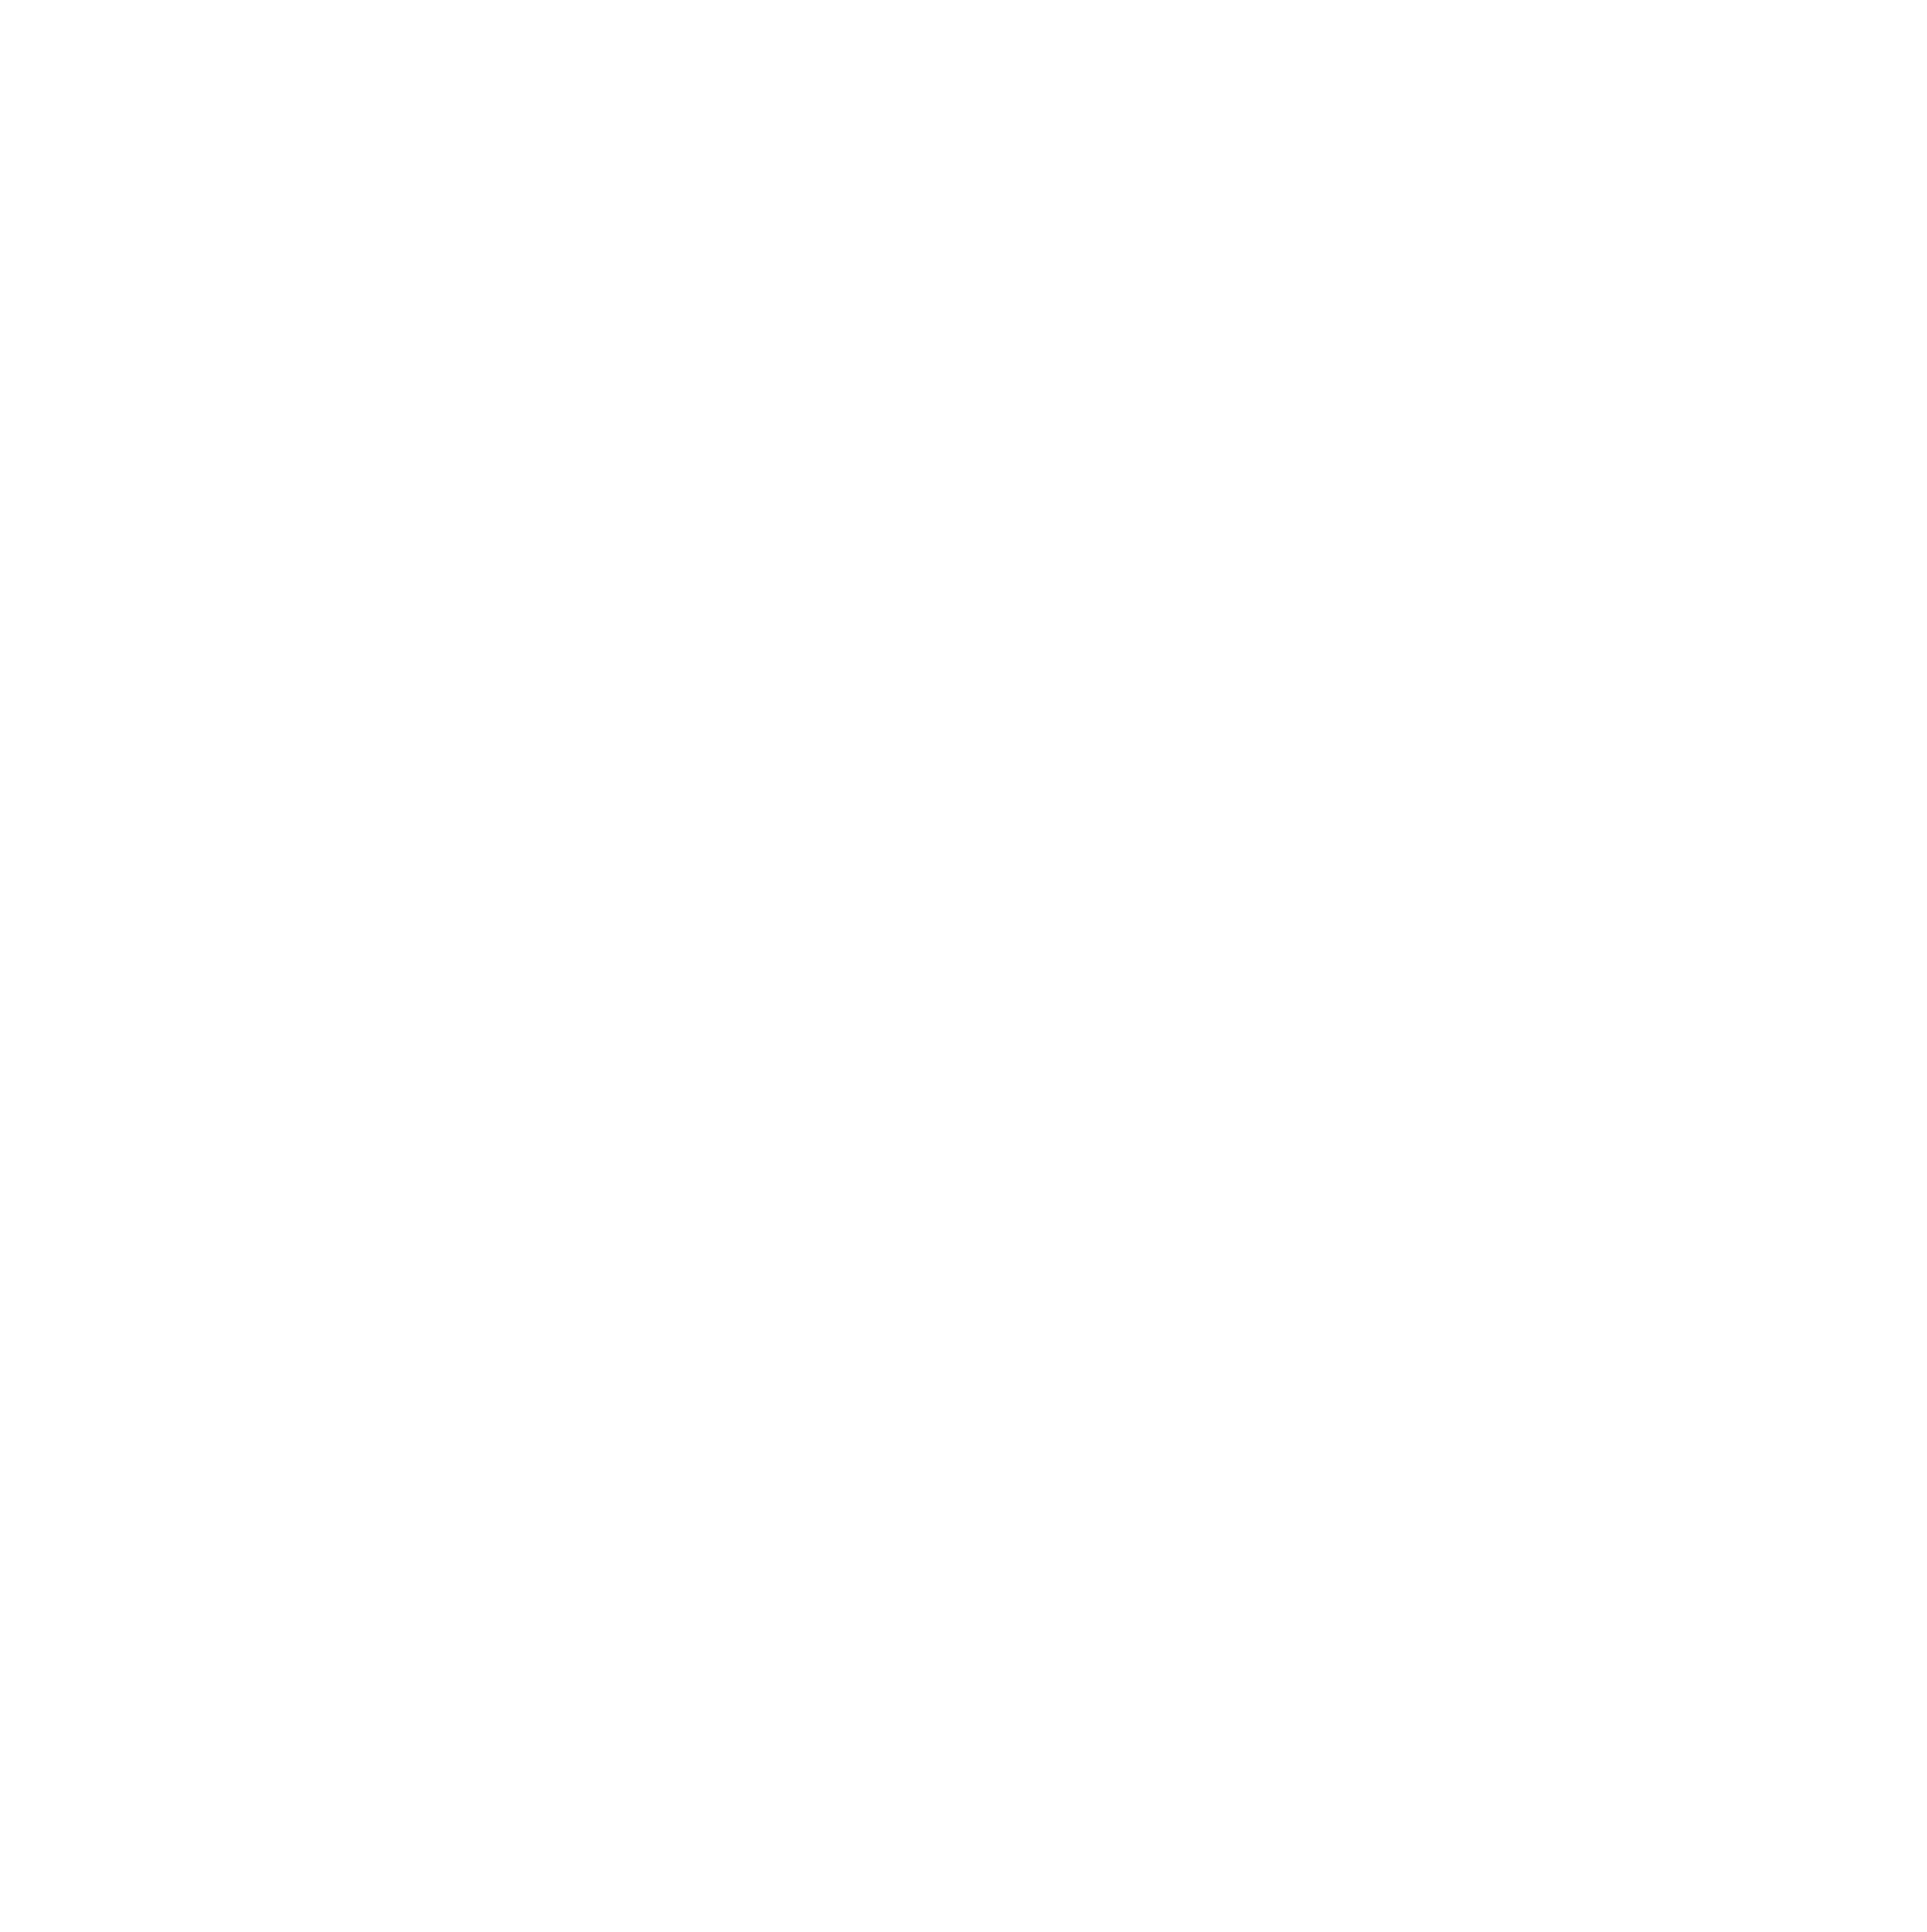 Restaurant Firenze Forretter suppe ikon